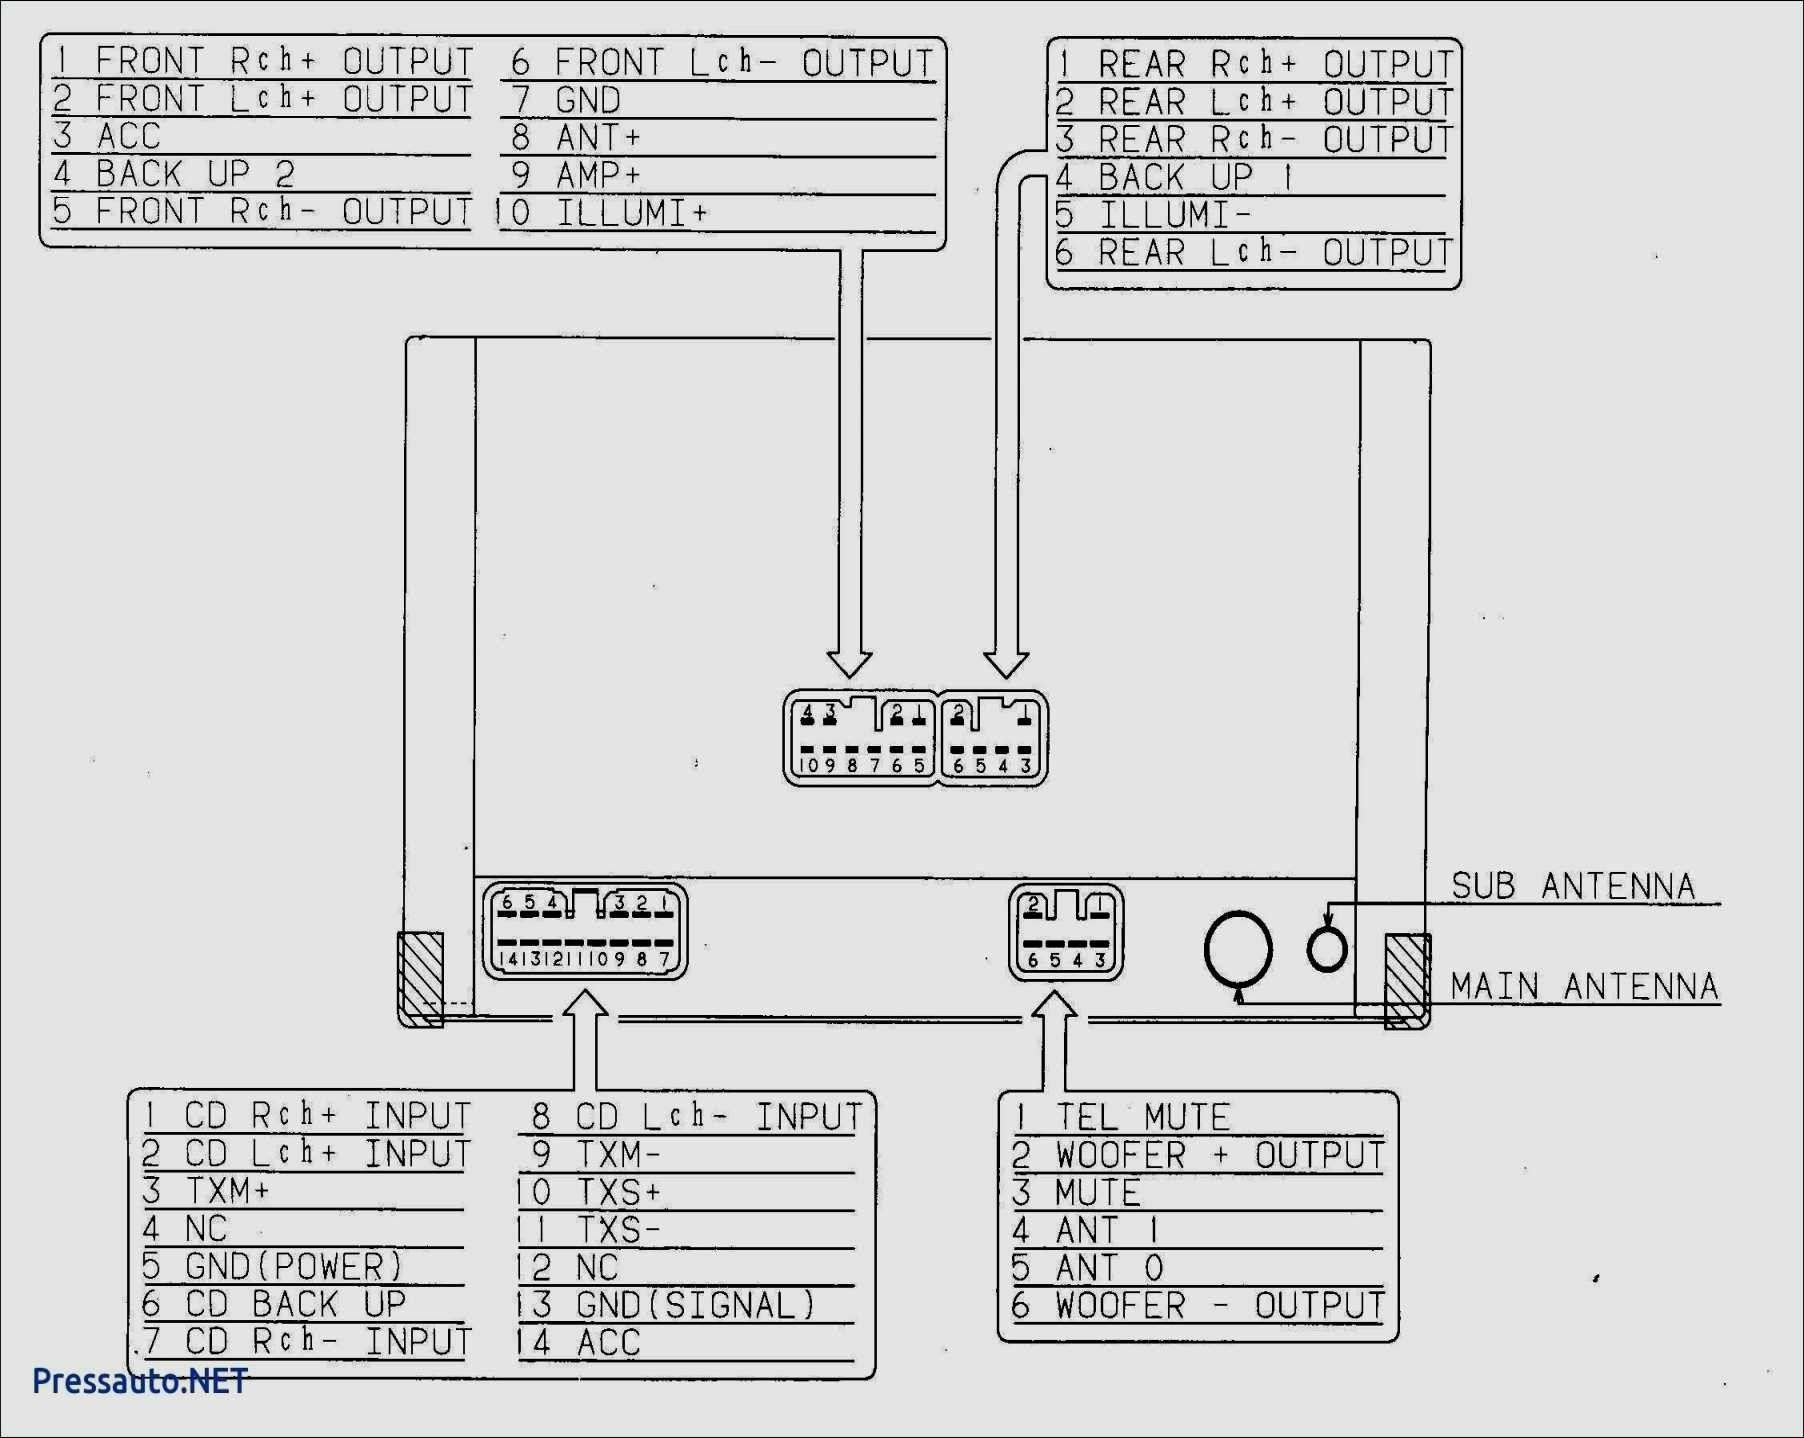 New Wiring Diagram For Car Audio Equalizer Car Stereo Pioneer Car Stereo Sony Car Stereo